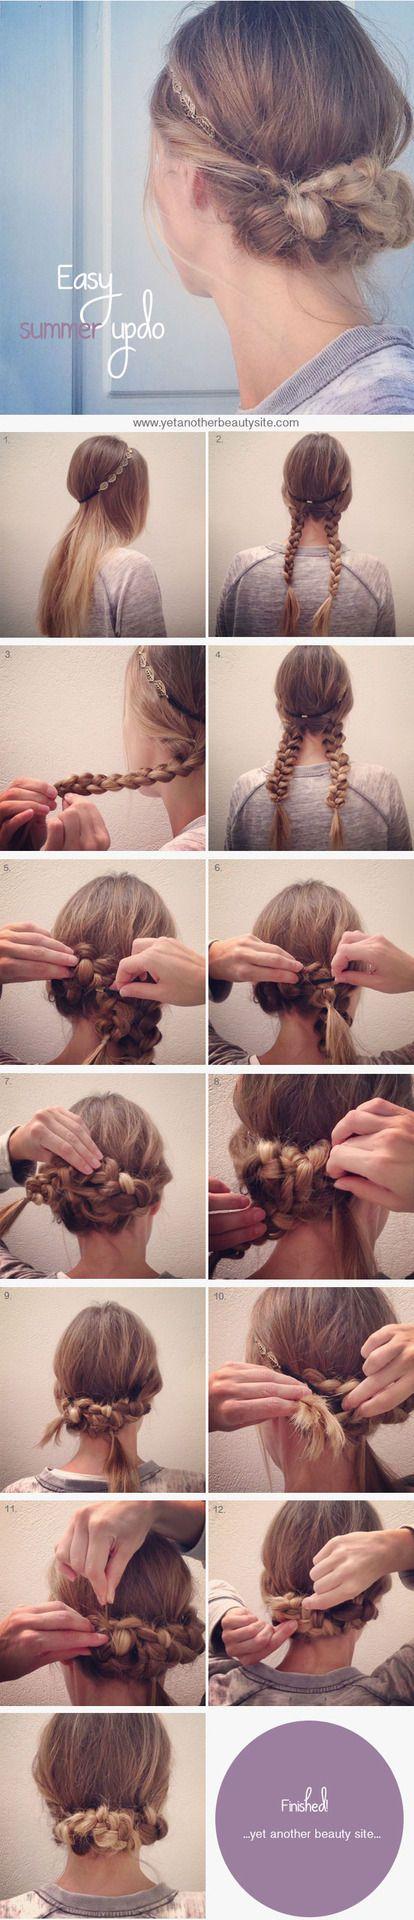 Braided headband updo how to